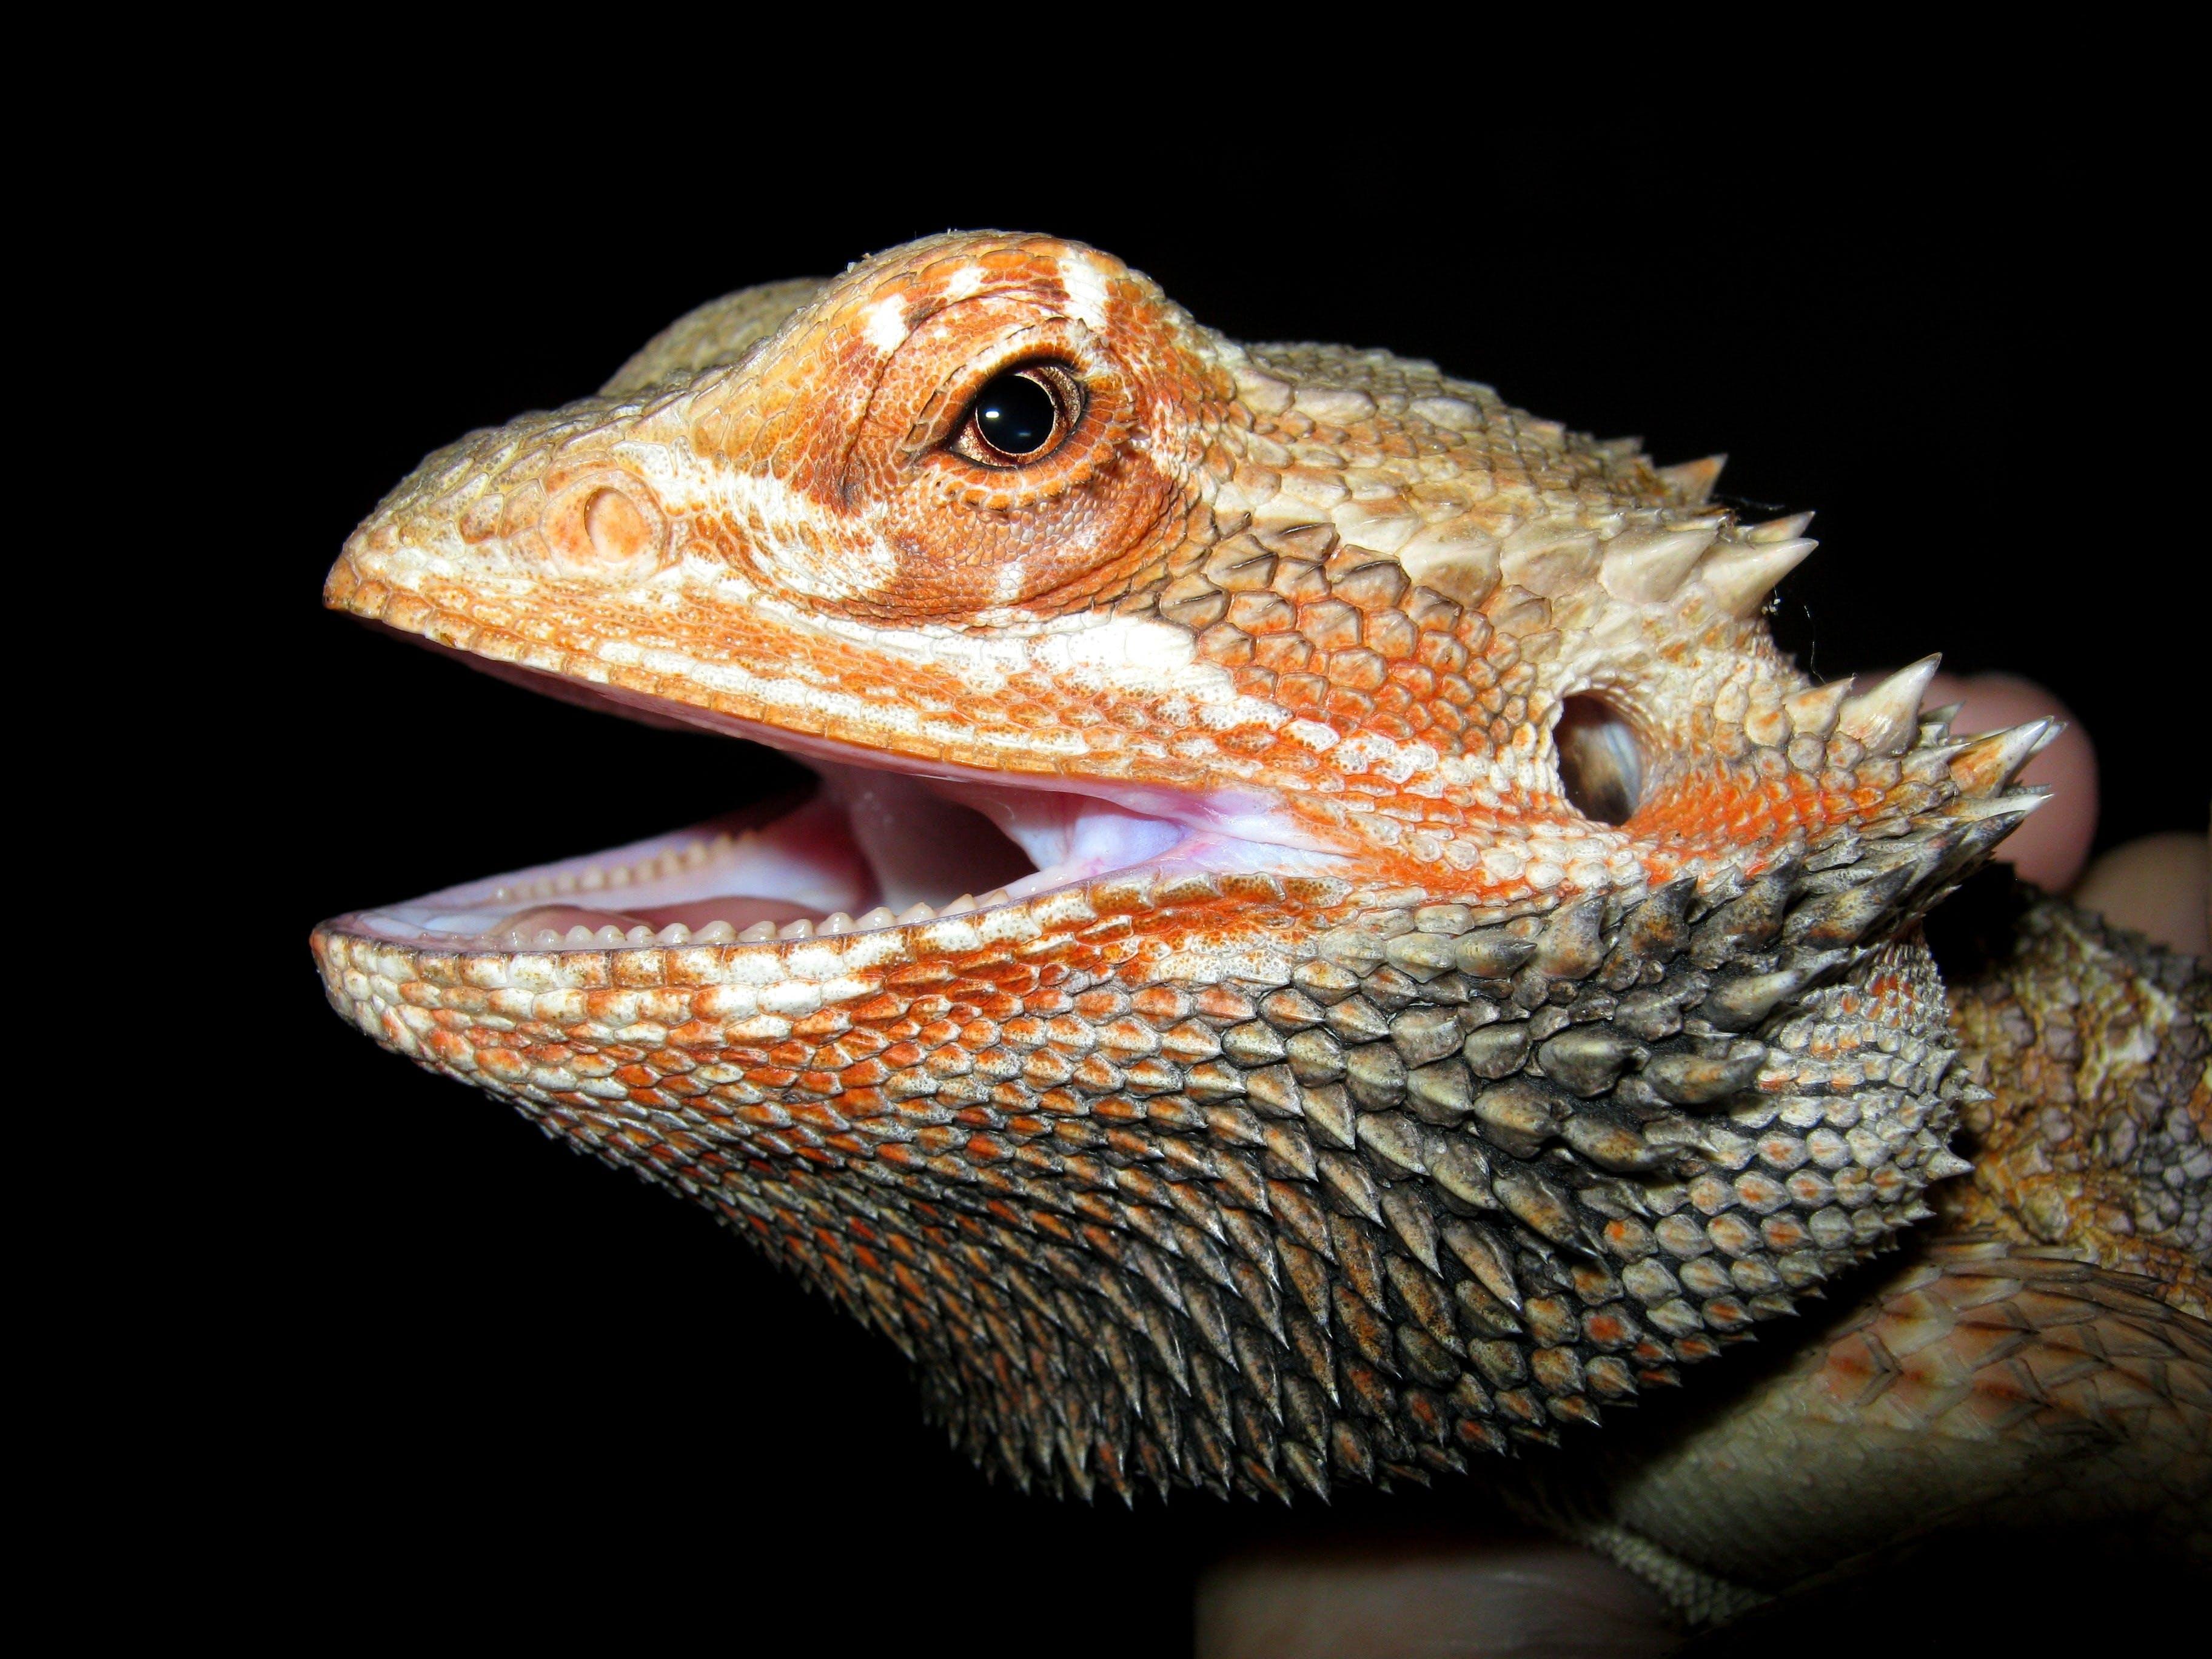 animal, bearded dragon, lizard